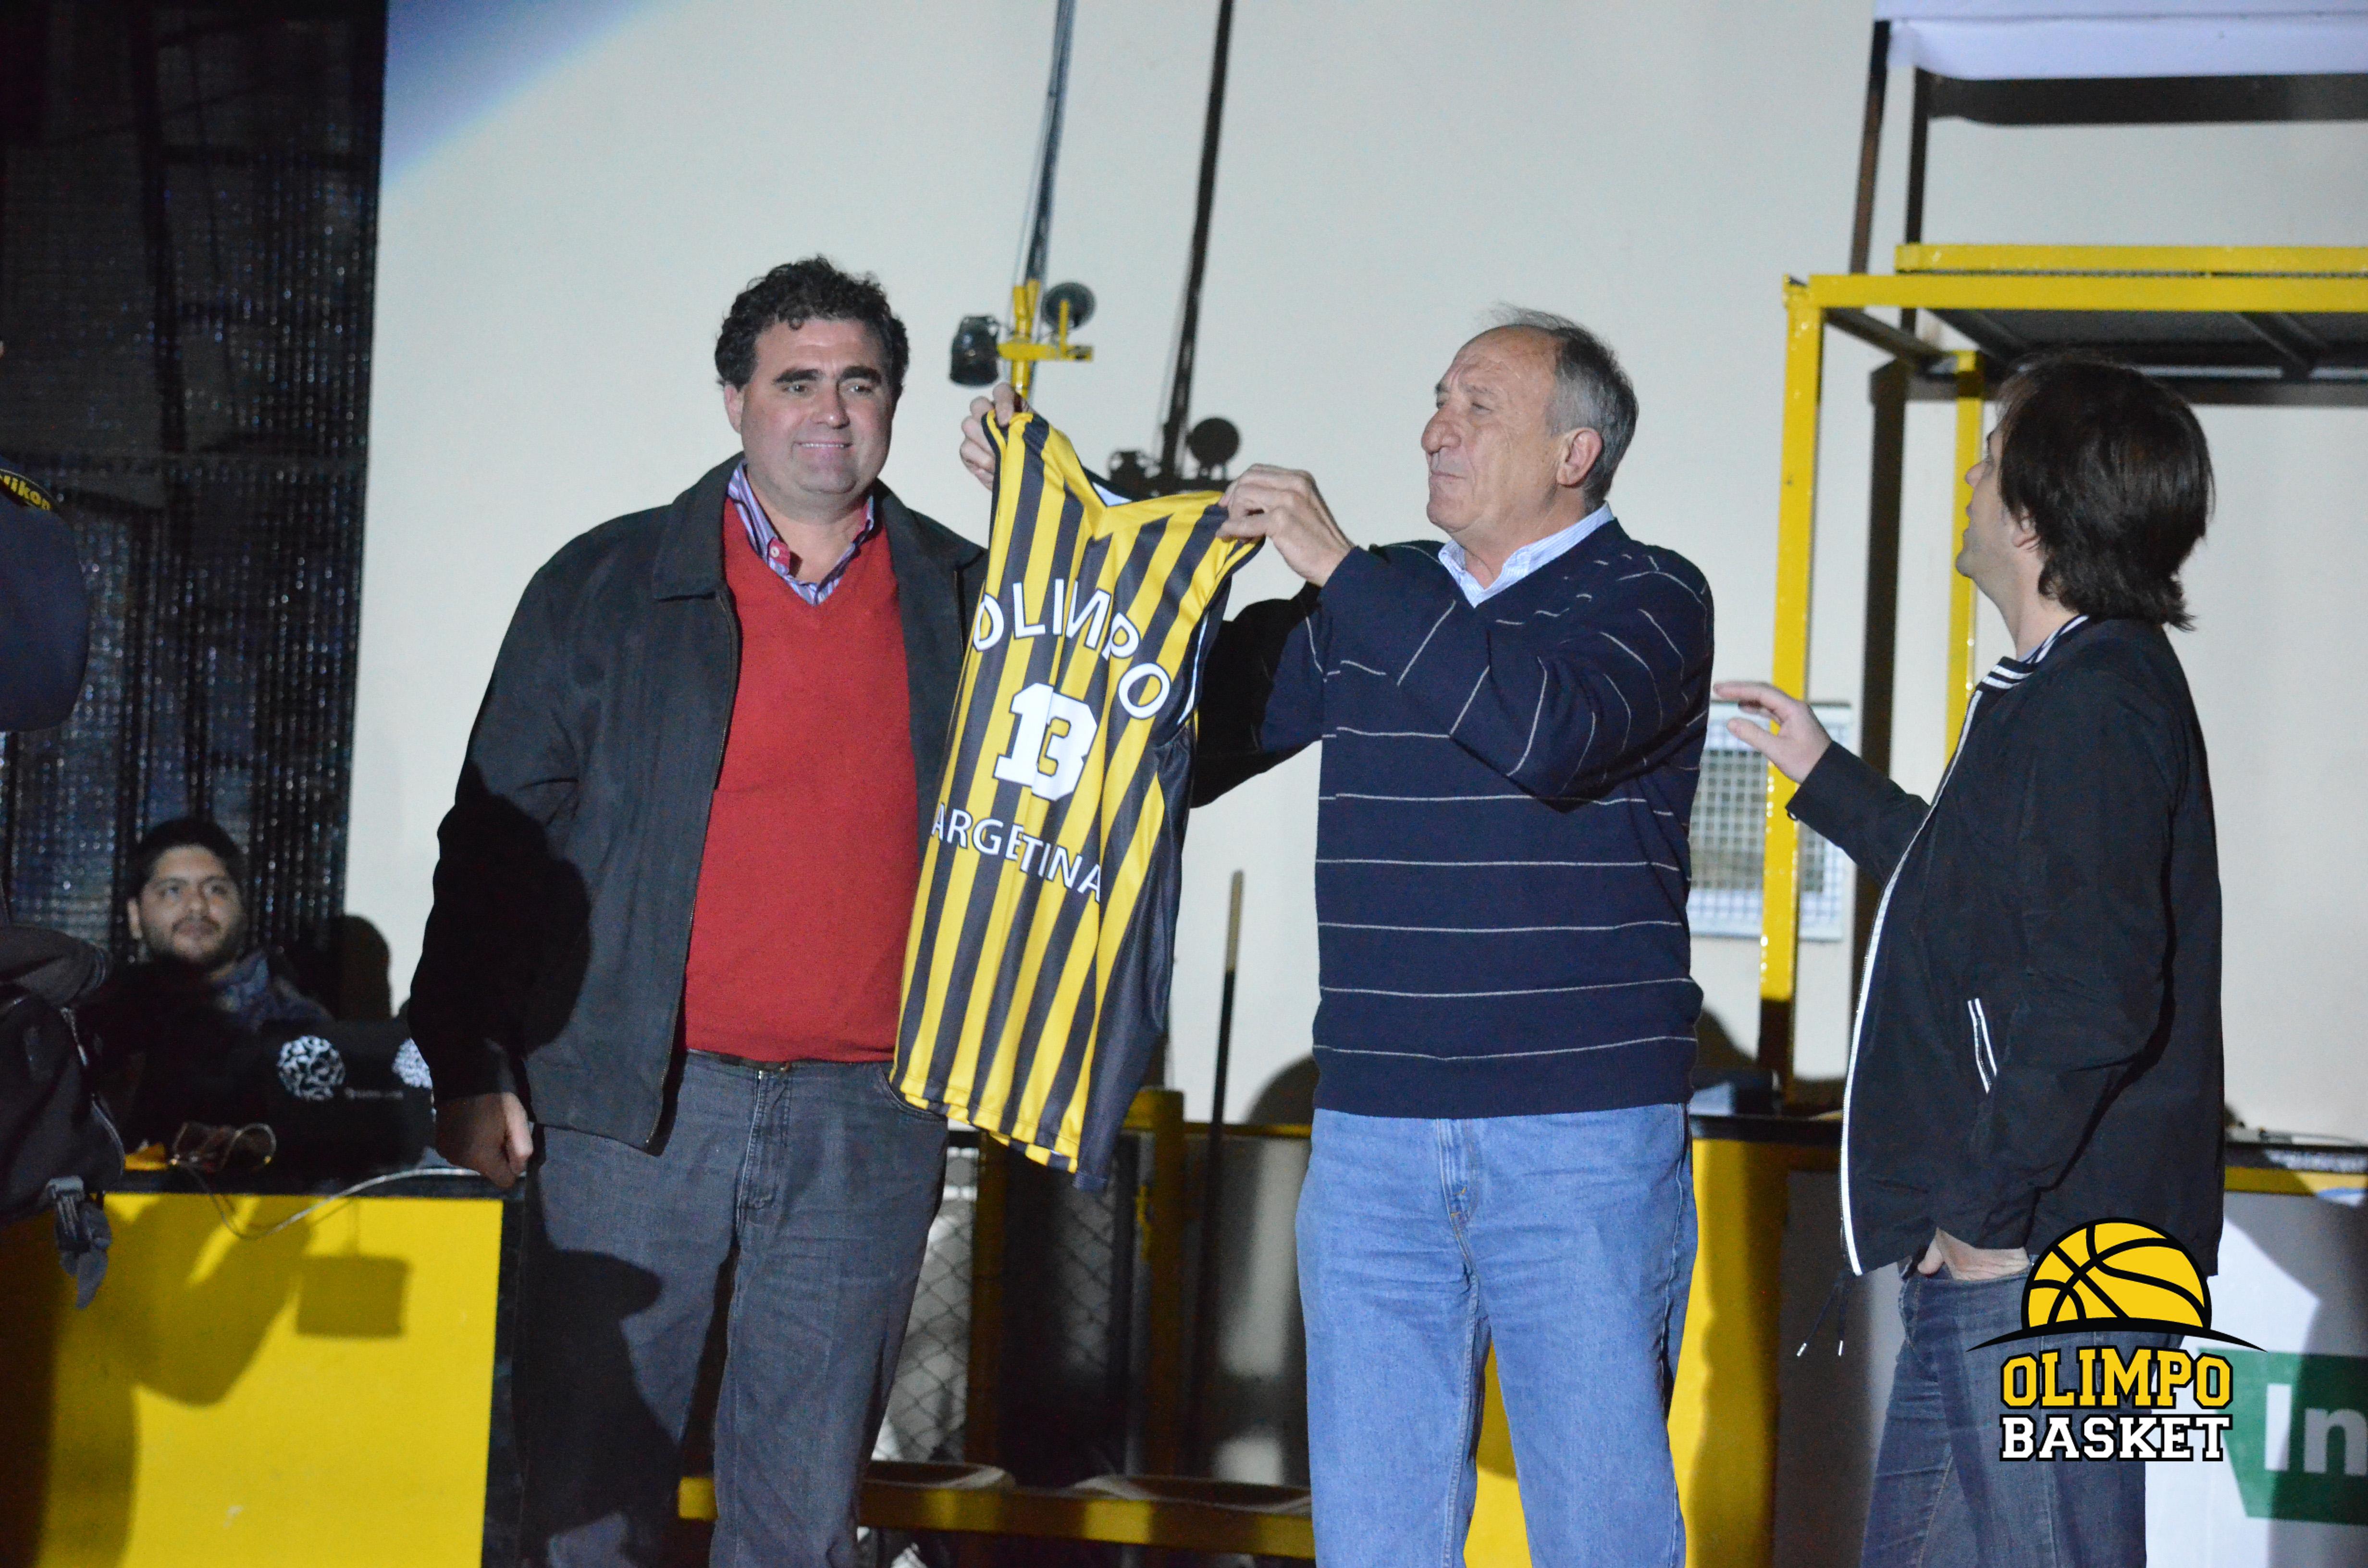 Olimpo Basket - Alfredo Dagna, Adrián Monachesi, Rodrigo Gómez